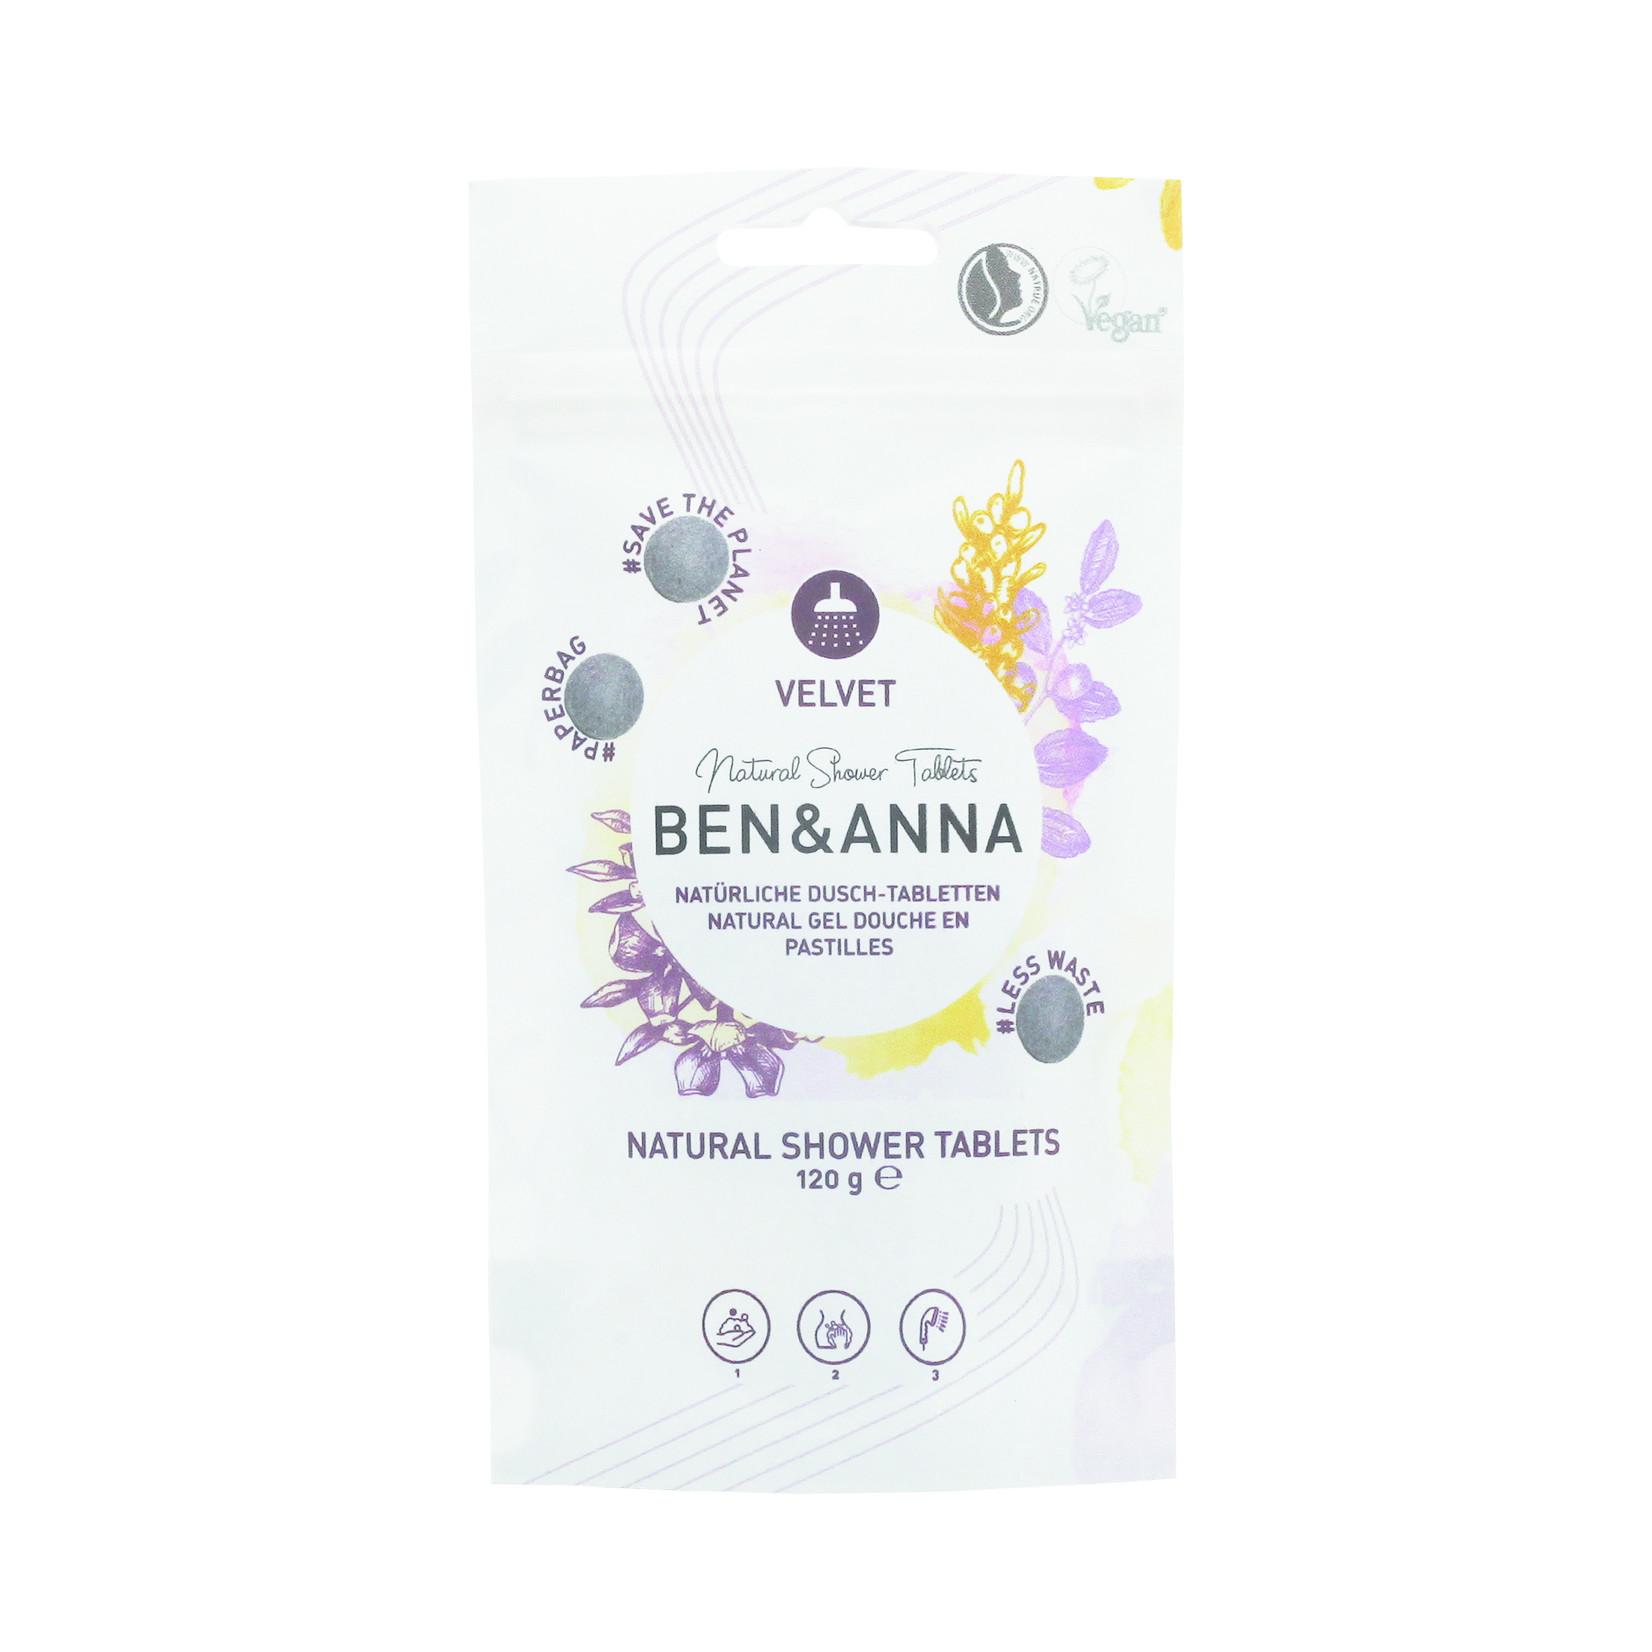 Ben & Anna Ben & Anna Natural Shower Tablets - Velvet